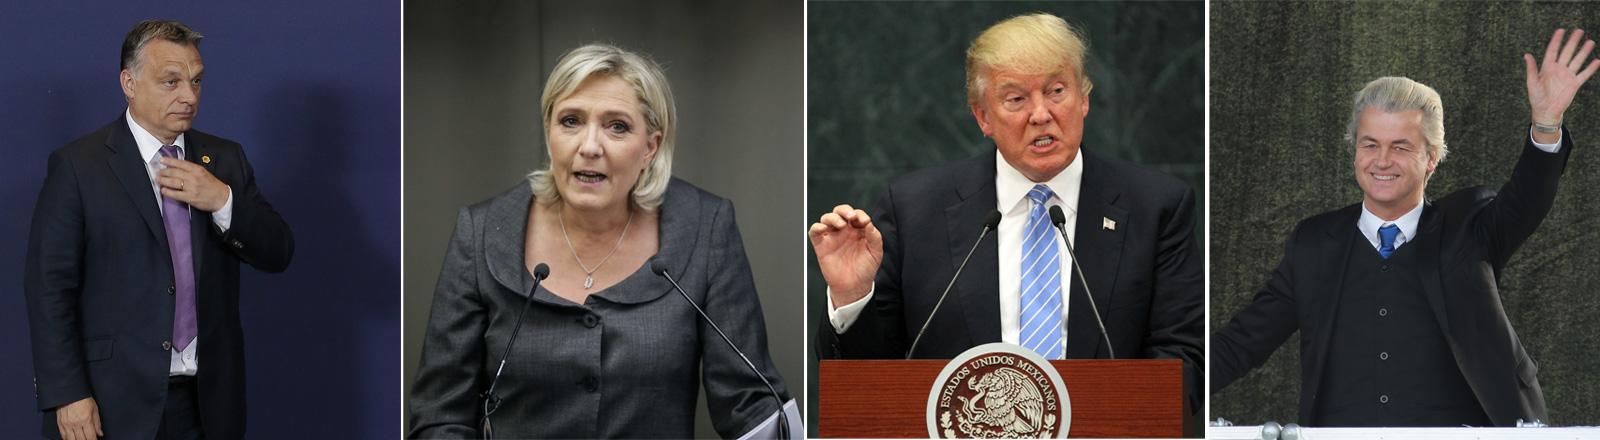 Viktor Orban, Marine Le Pen, Donald Trump, Geert Wilders